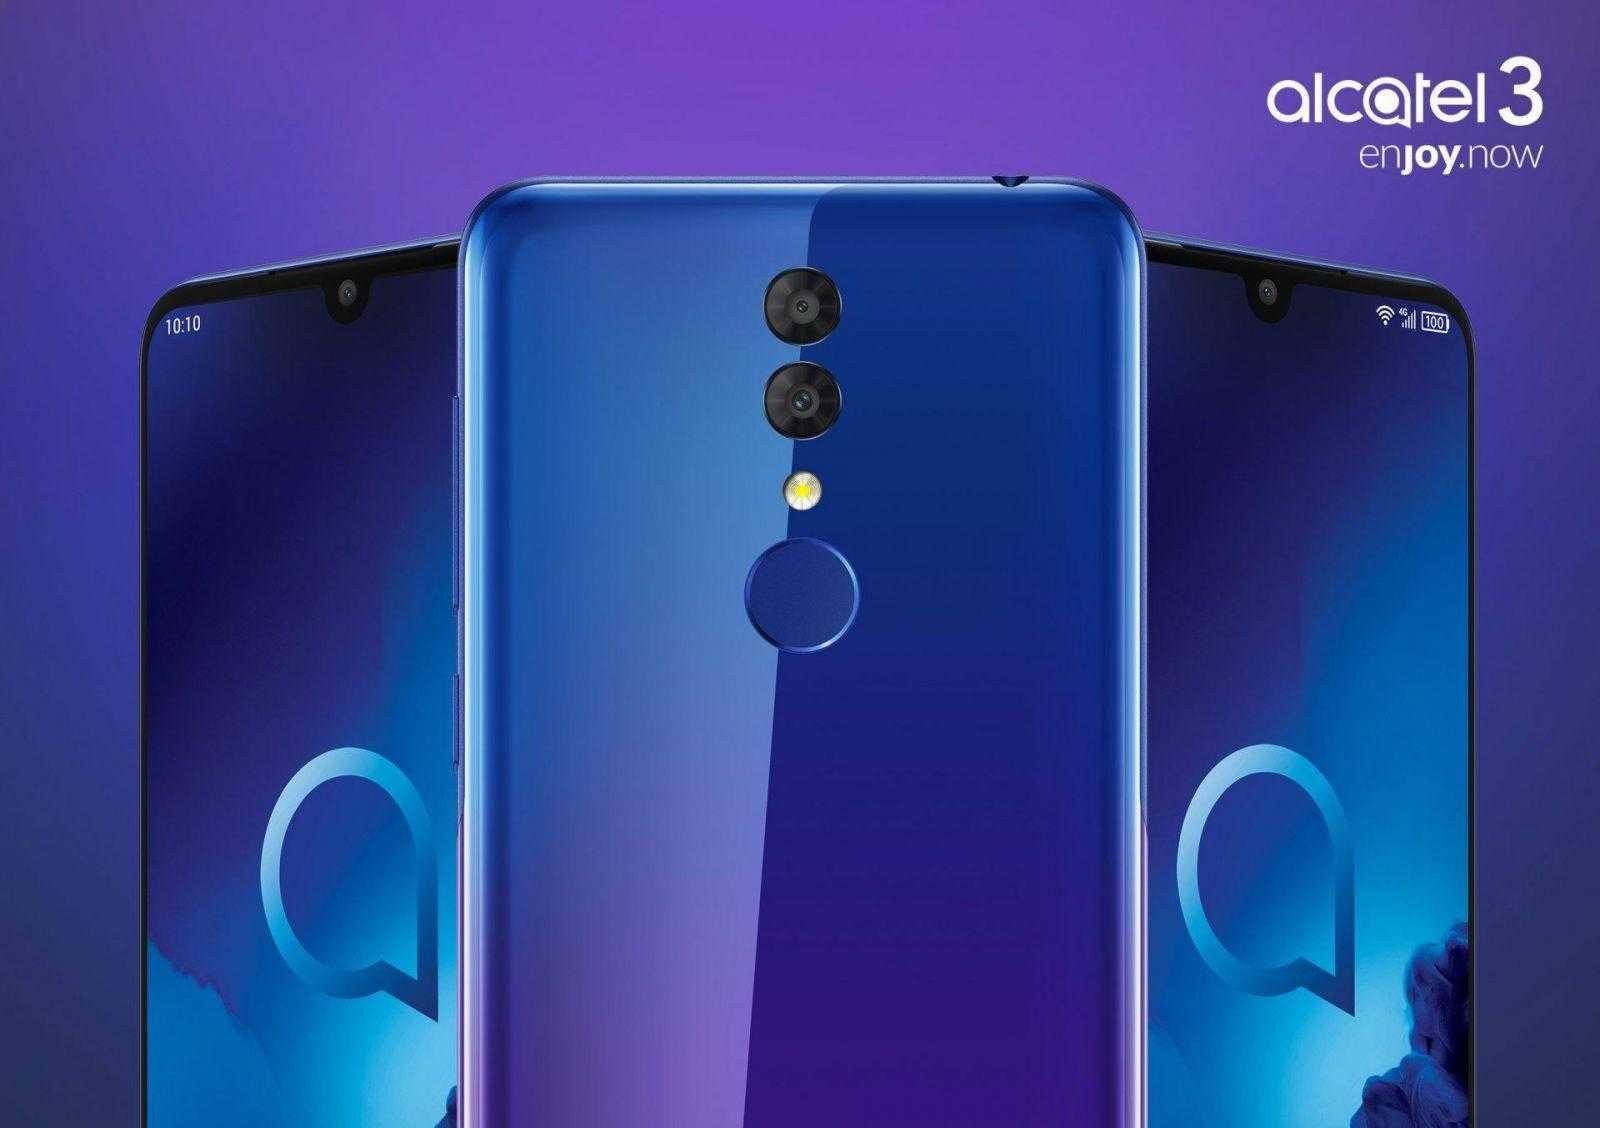 MWC 2019. Alcatel показала смартфоны 3-й серии Alcatel 3 и 3L (Alcatel 3 pressview 02)